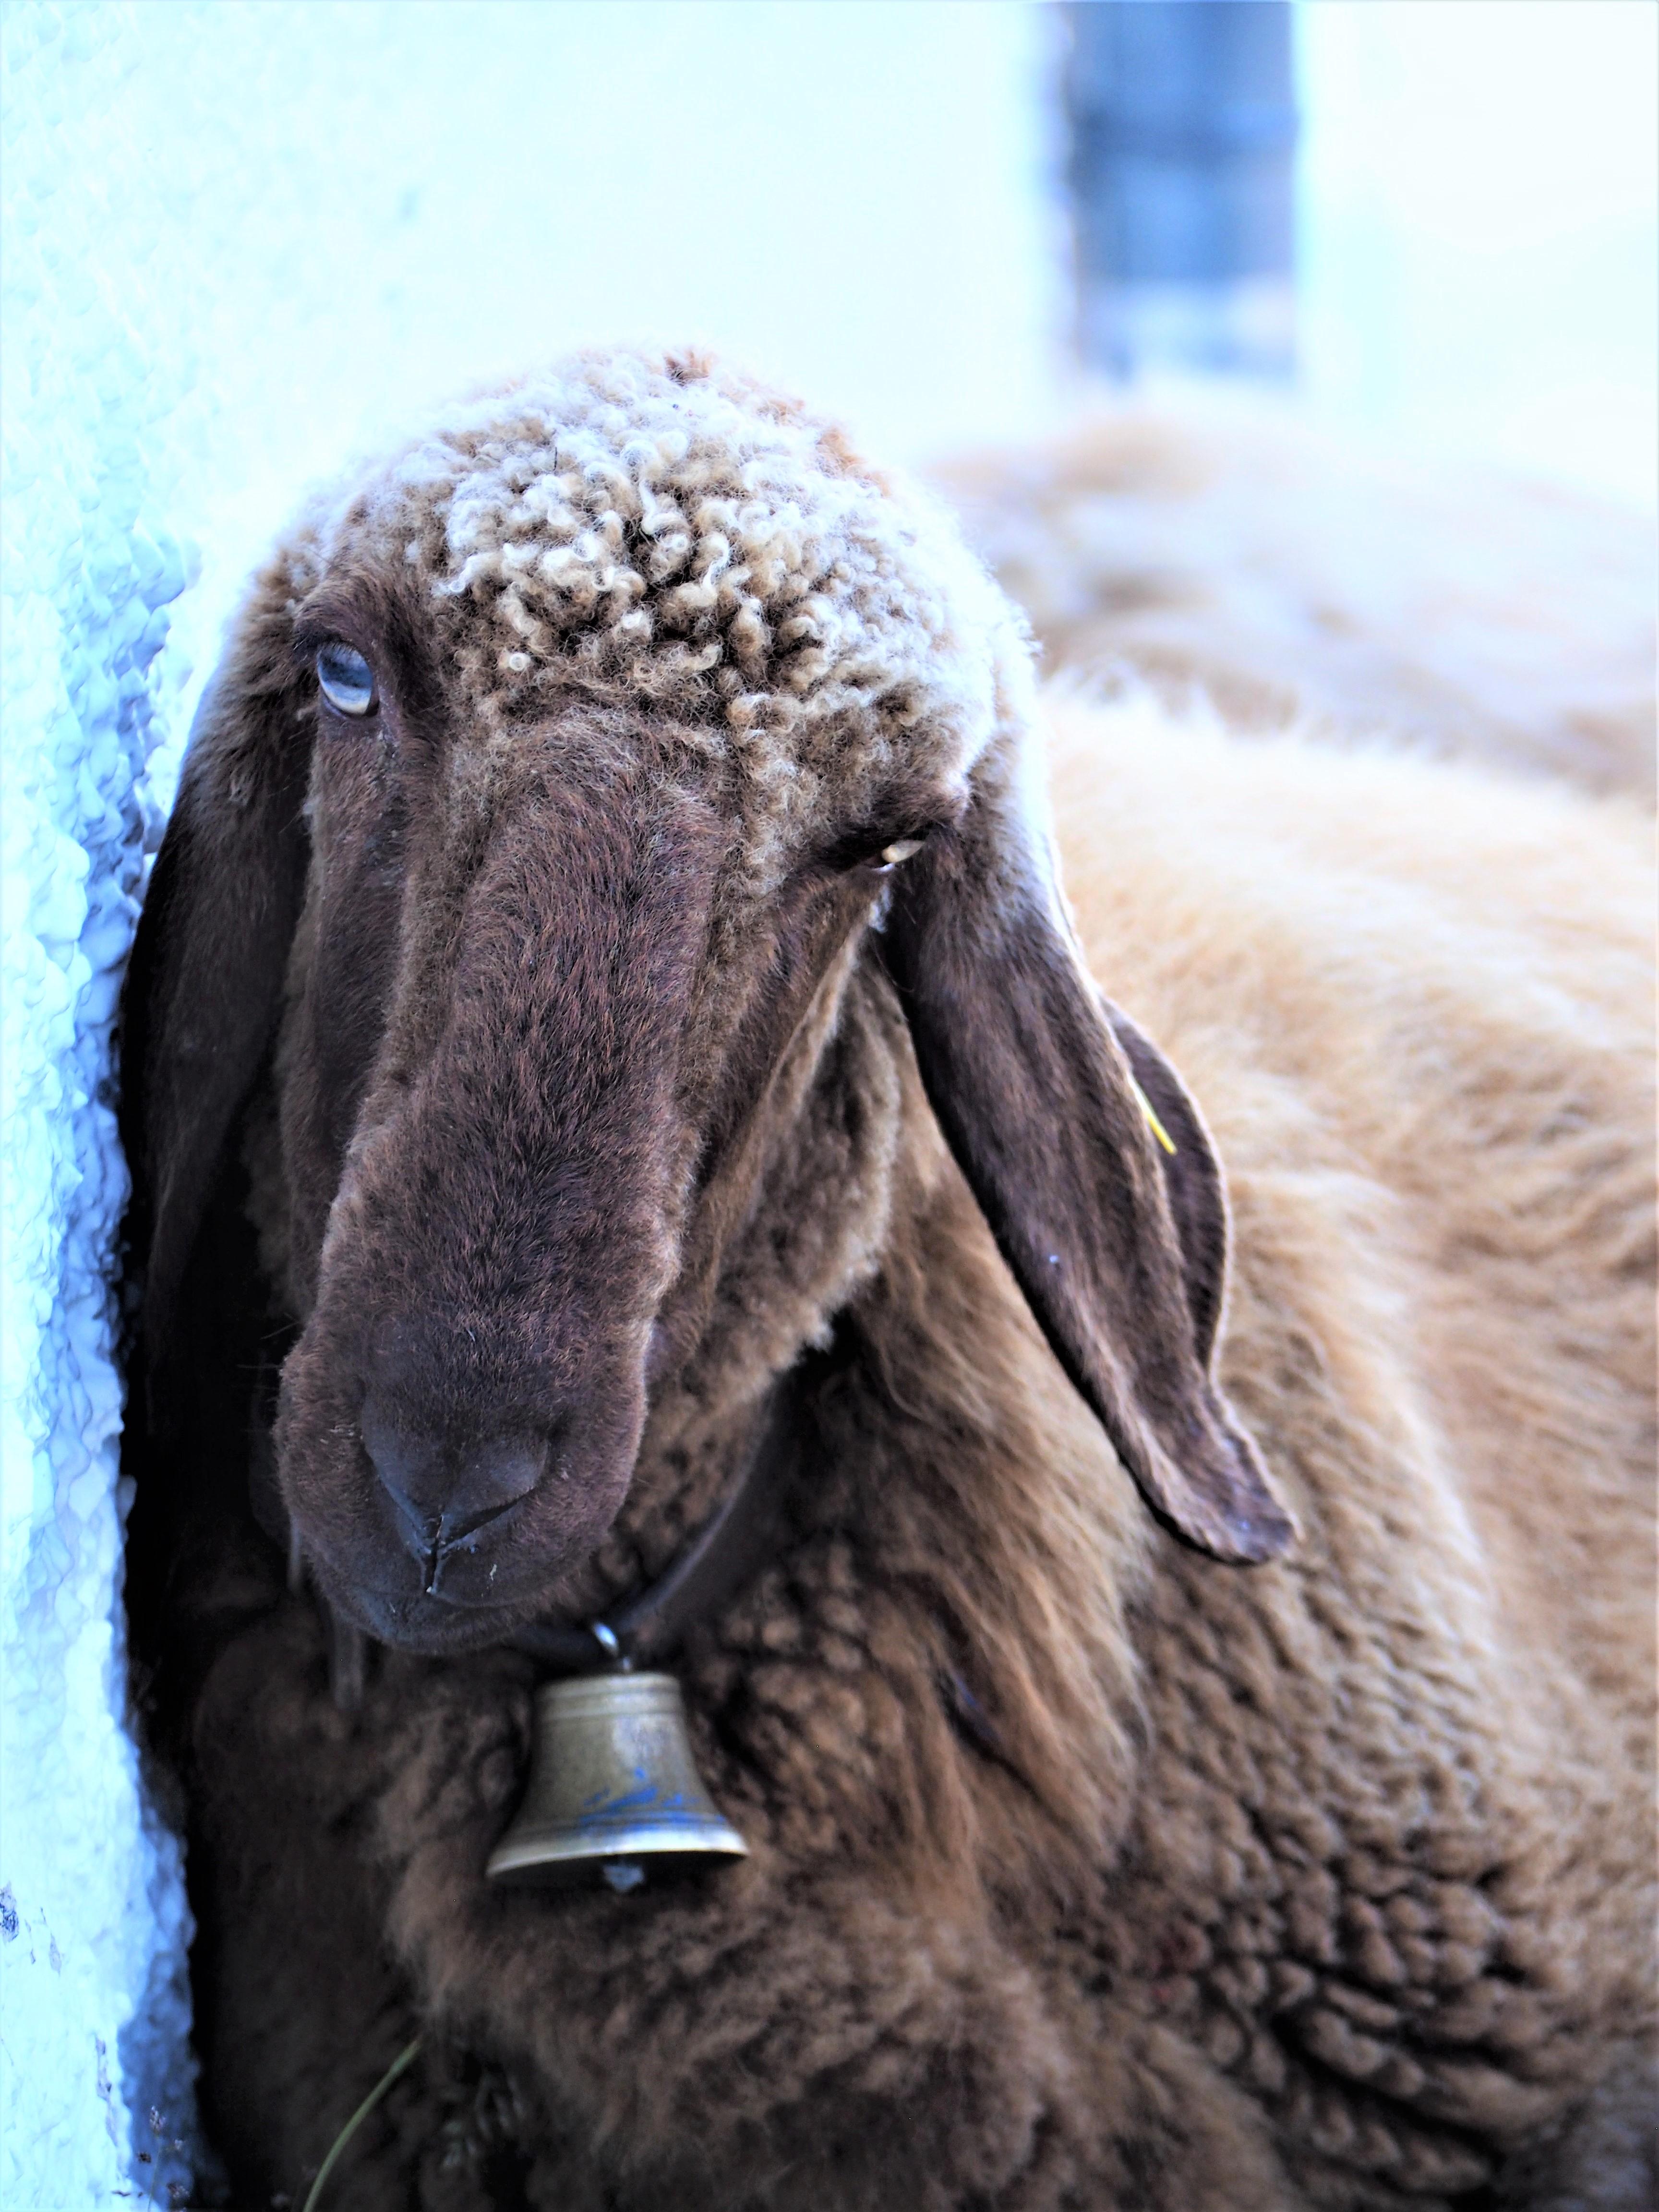 mouton du tyrol autriche innsbruck sommet